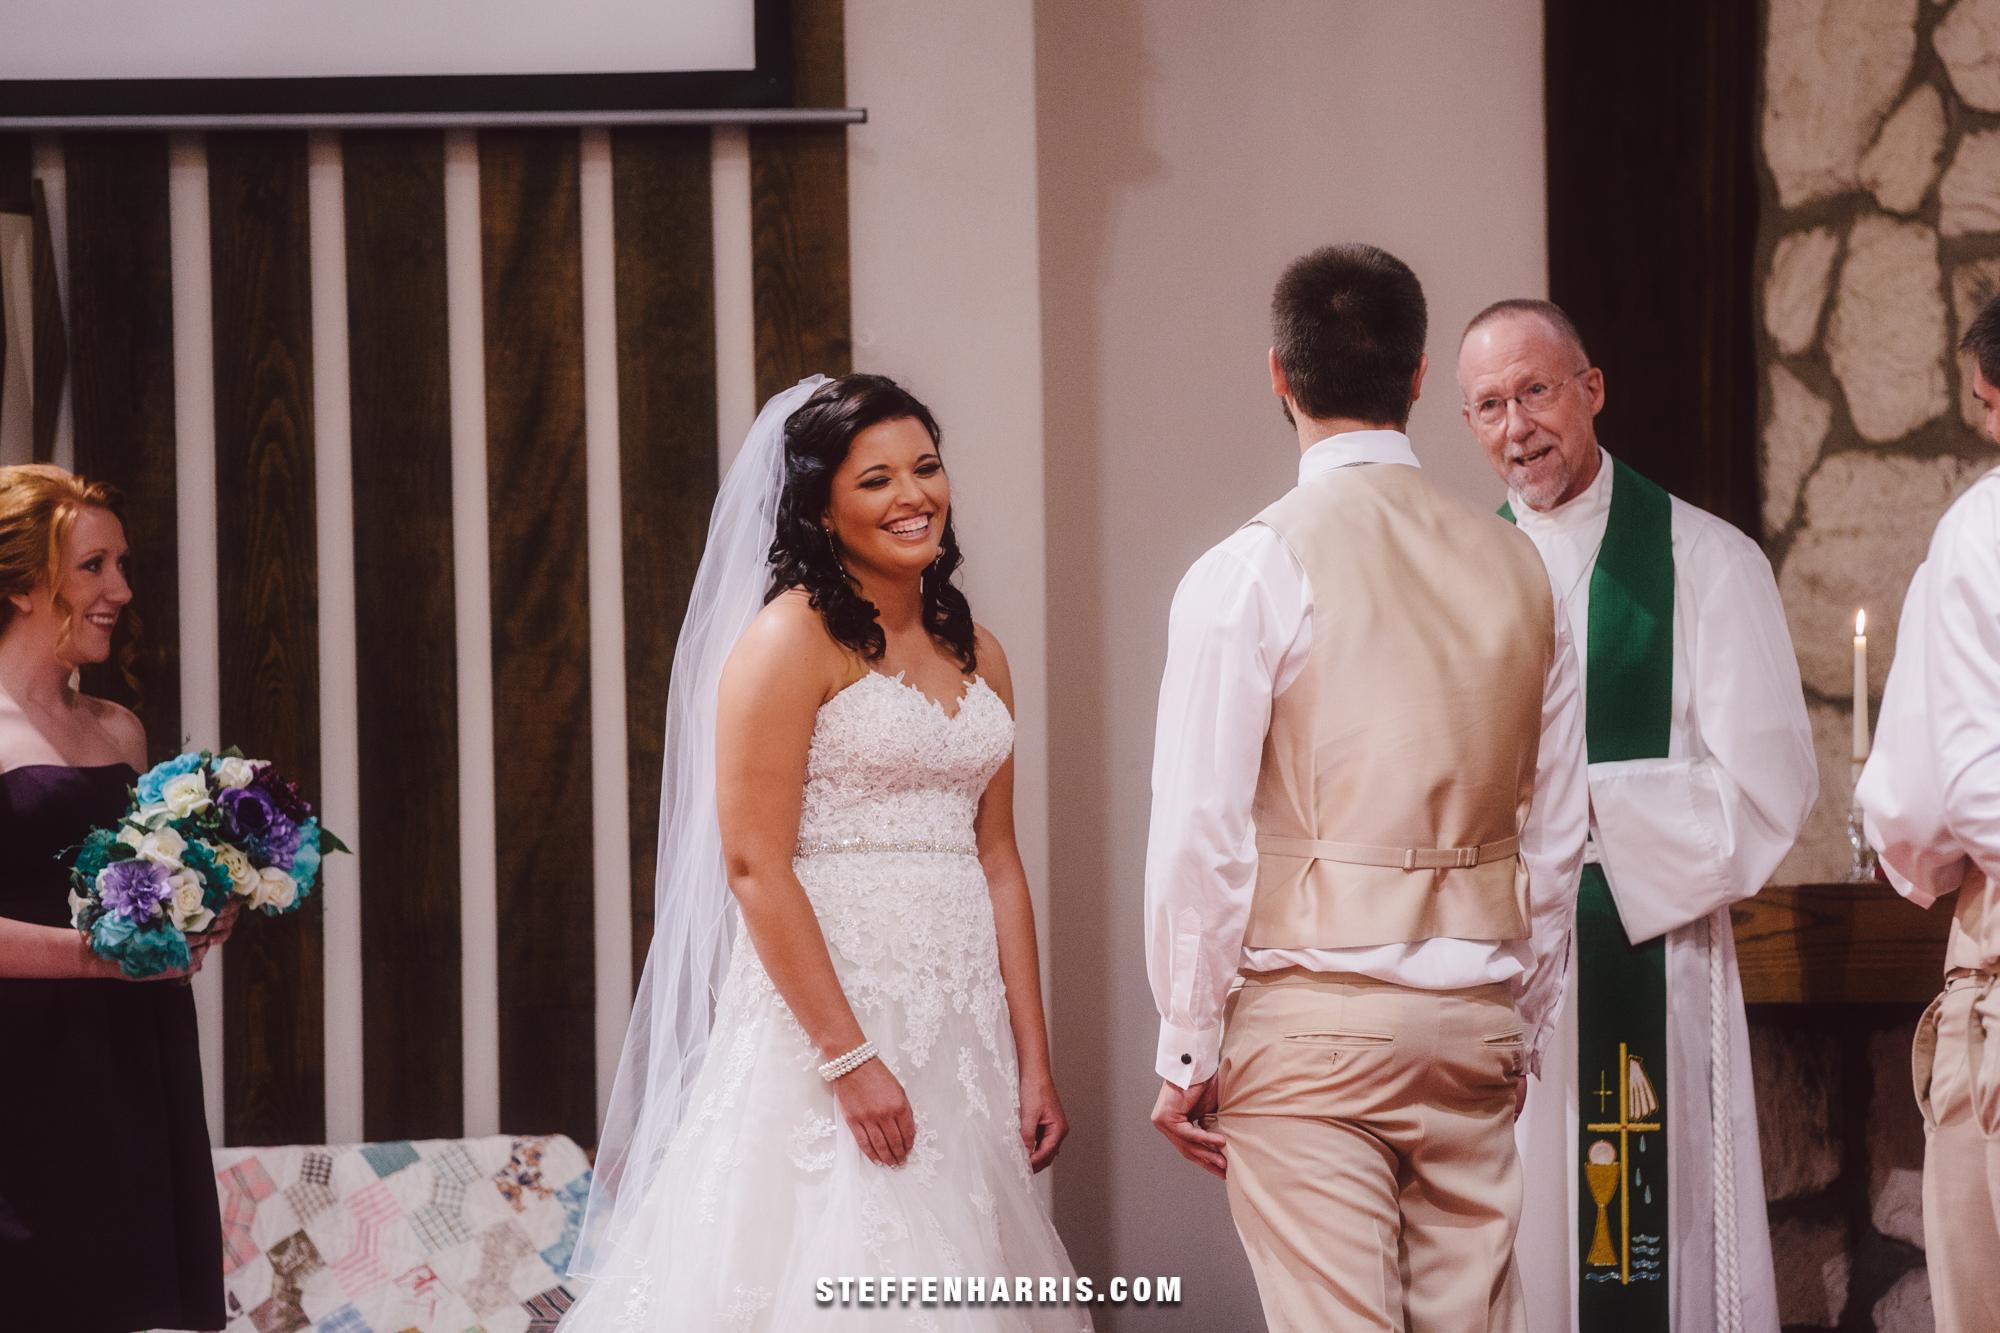 casey-aaron-salem-il-wedding-photography-23